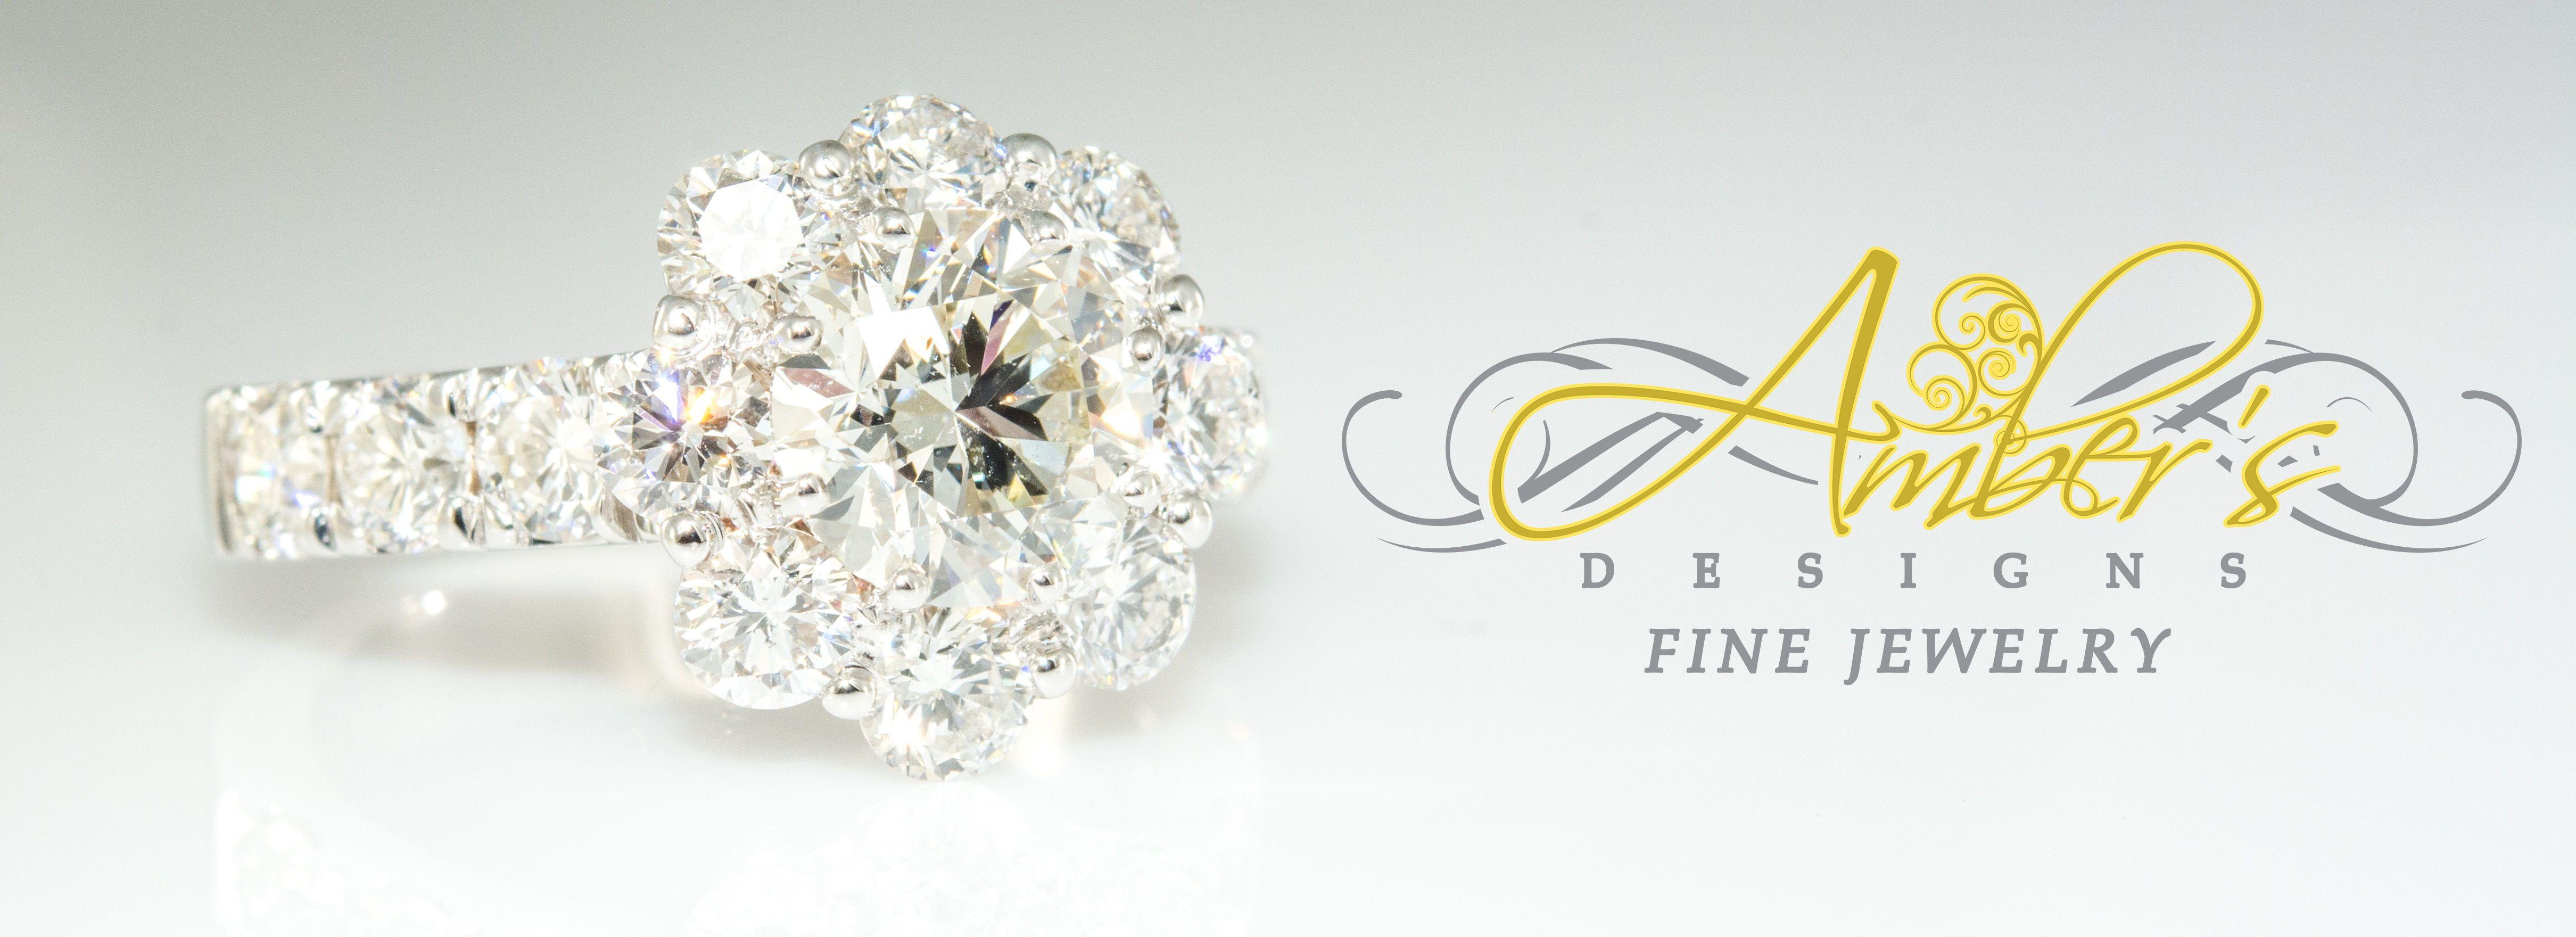 37+ Ambers designs fine jewelry ideas